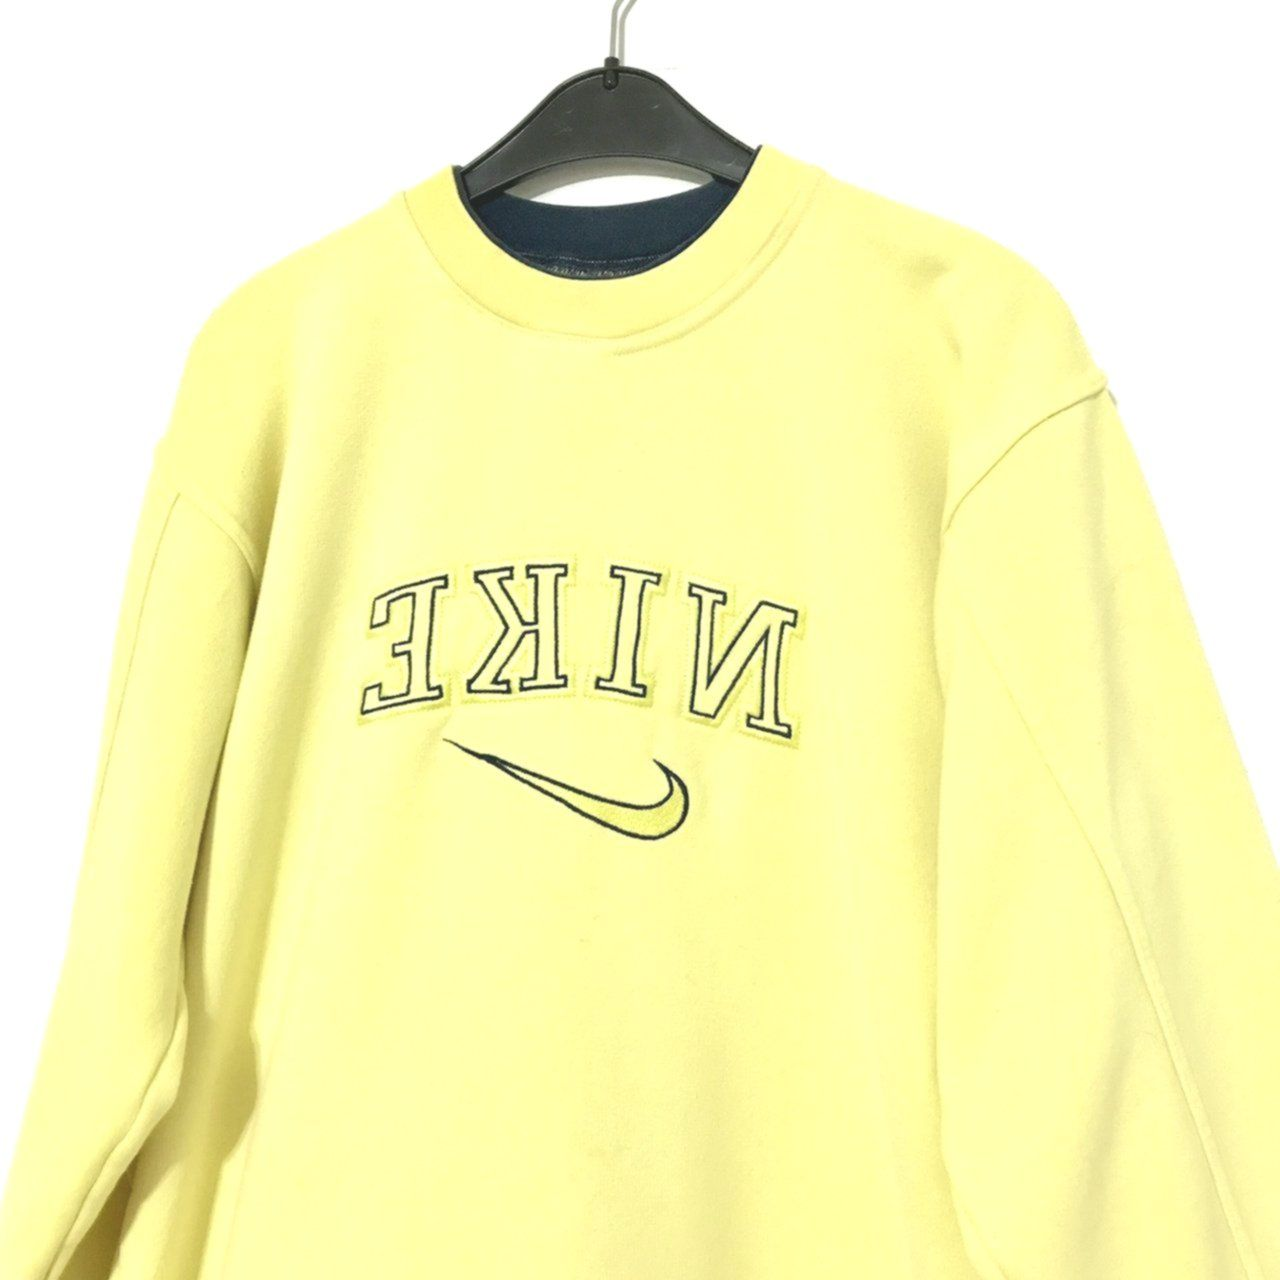 Vintage Nike Sweatshirt Size M Womens Good Condition Depop Vintage Nike Sweatshirt Sweatshirts Vintage Nike Sweatshirt Outfit [ 1280 x 1280 Pixel ]